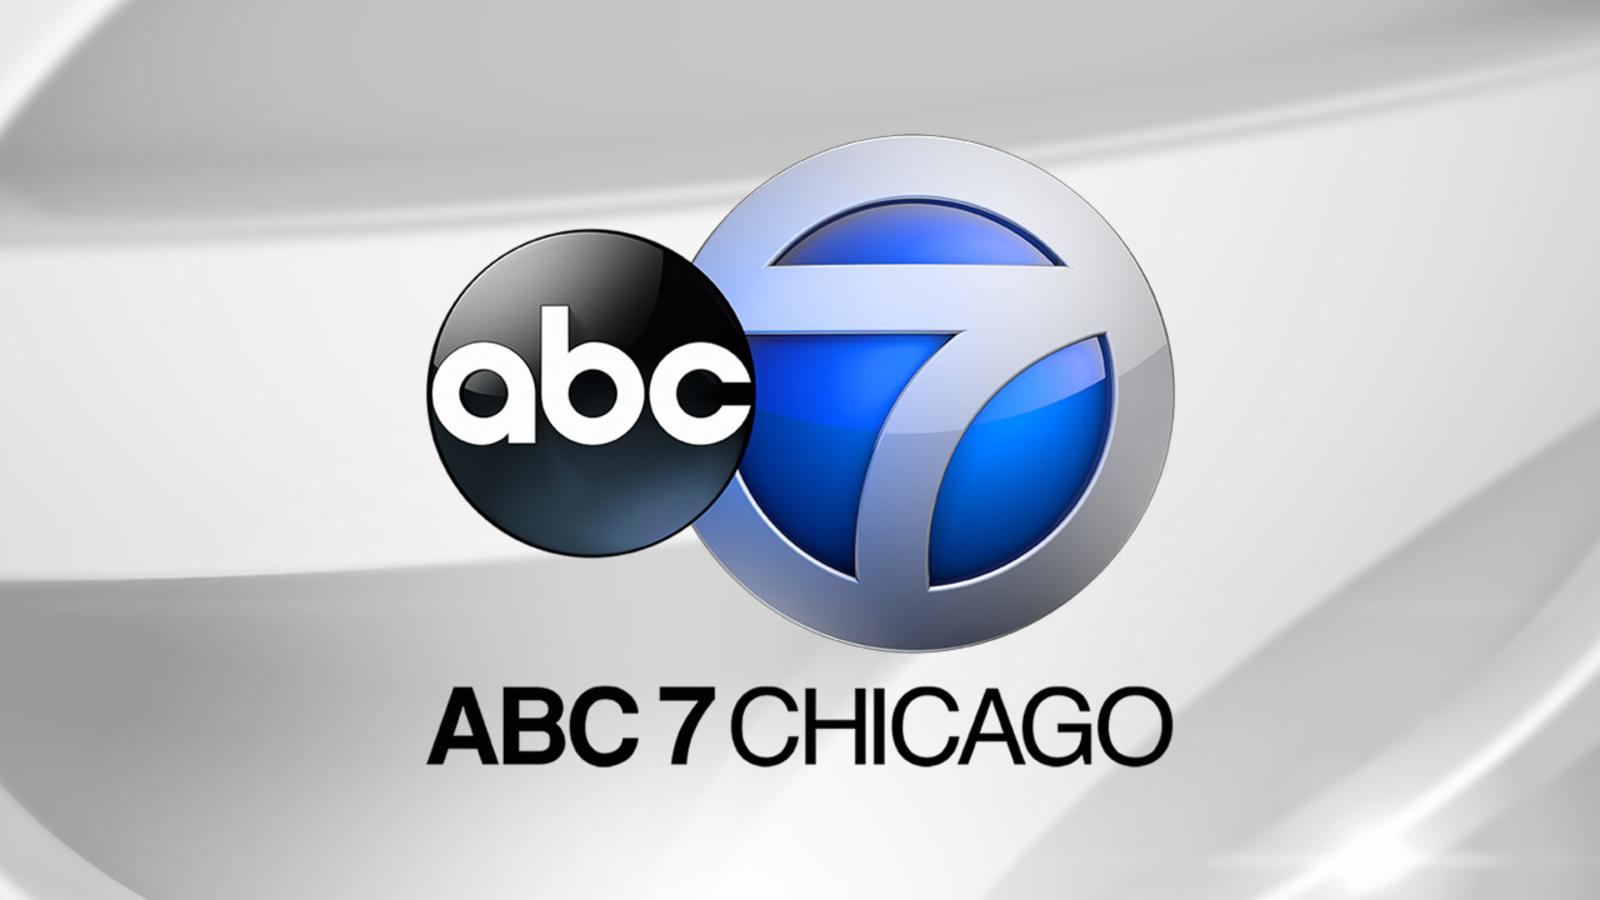 Contact ABC7 Chicago